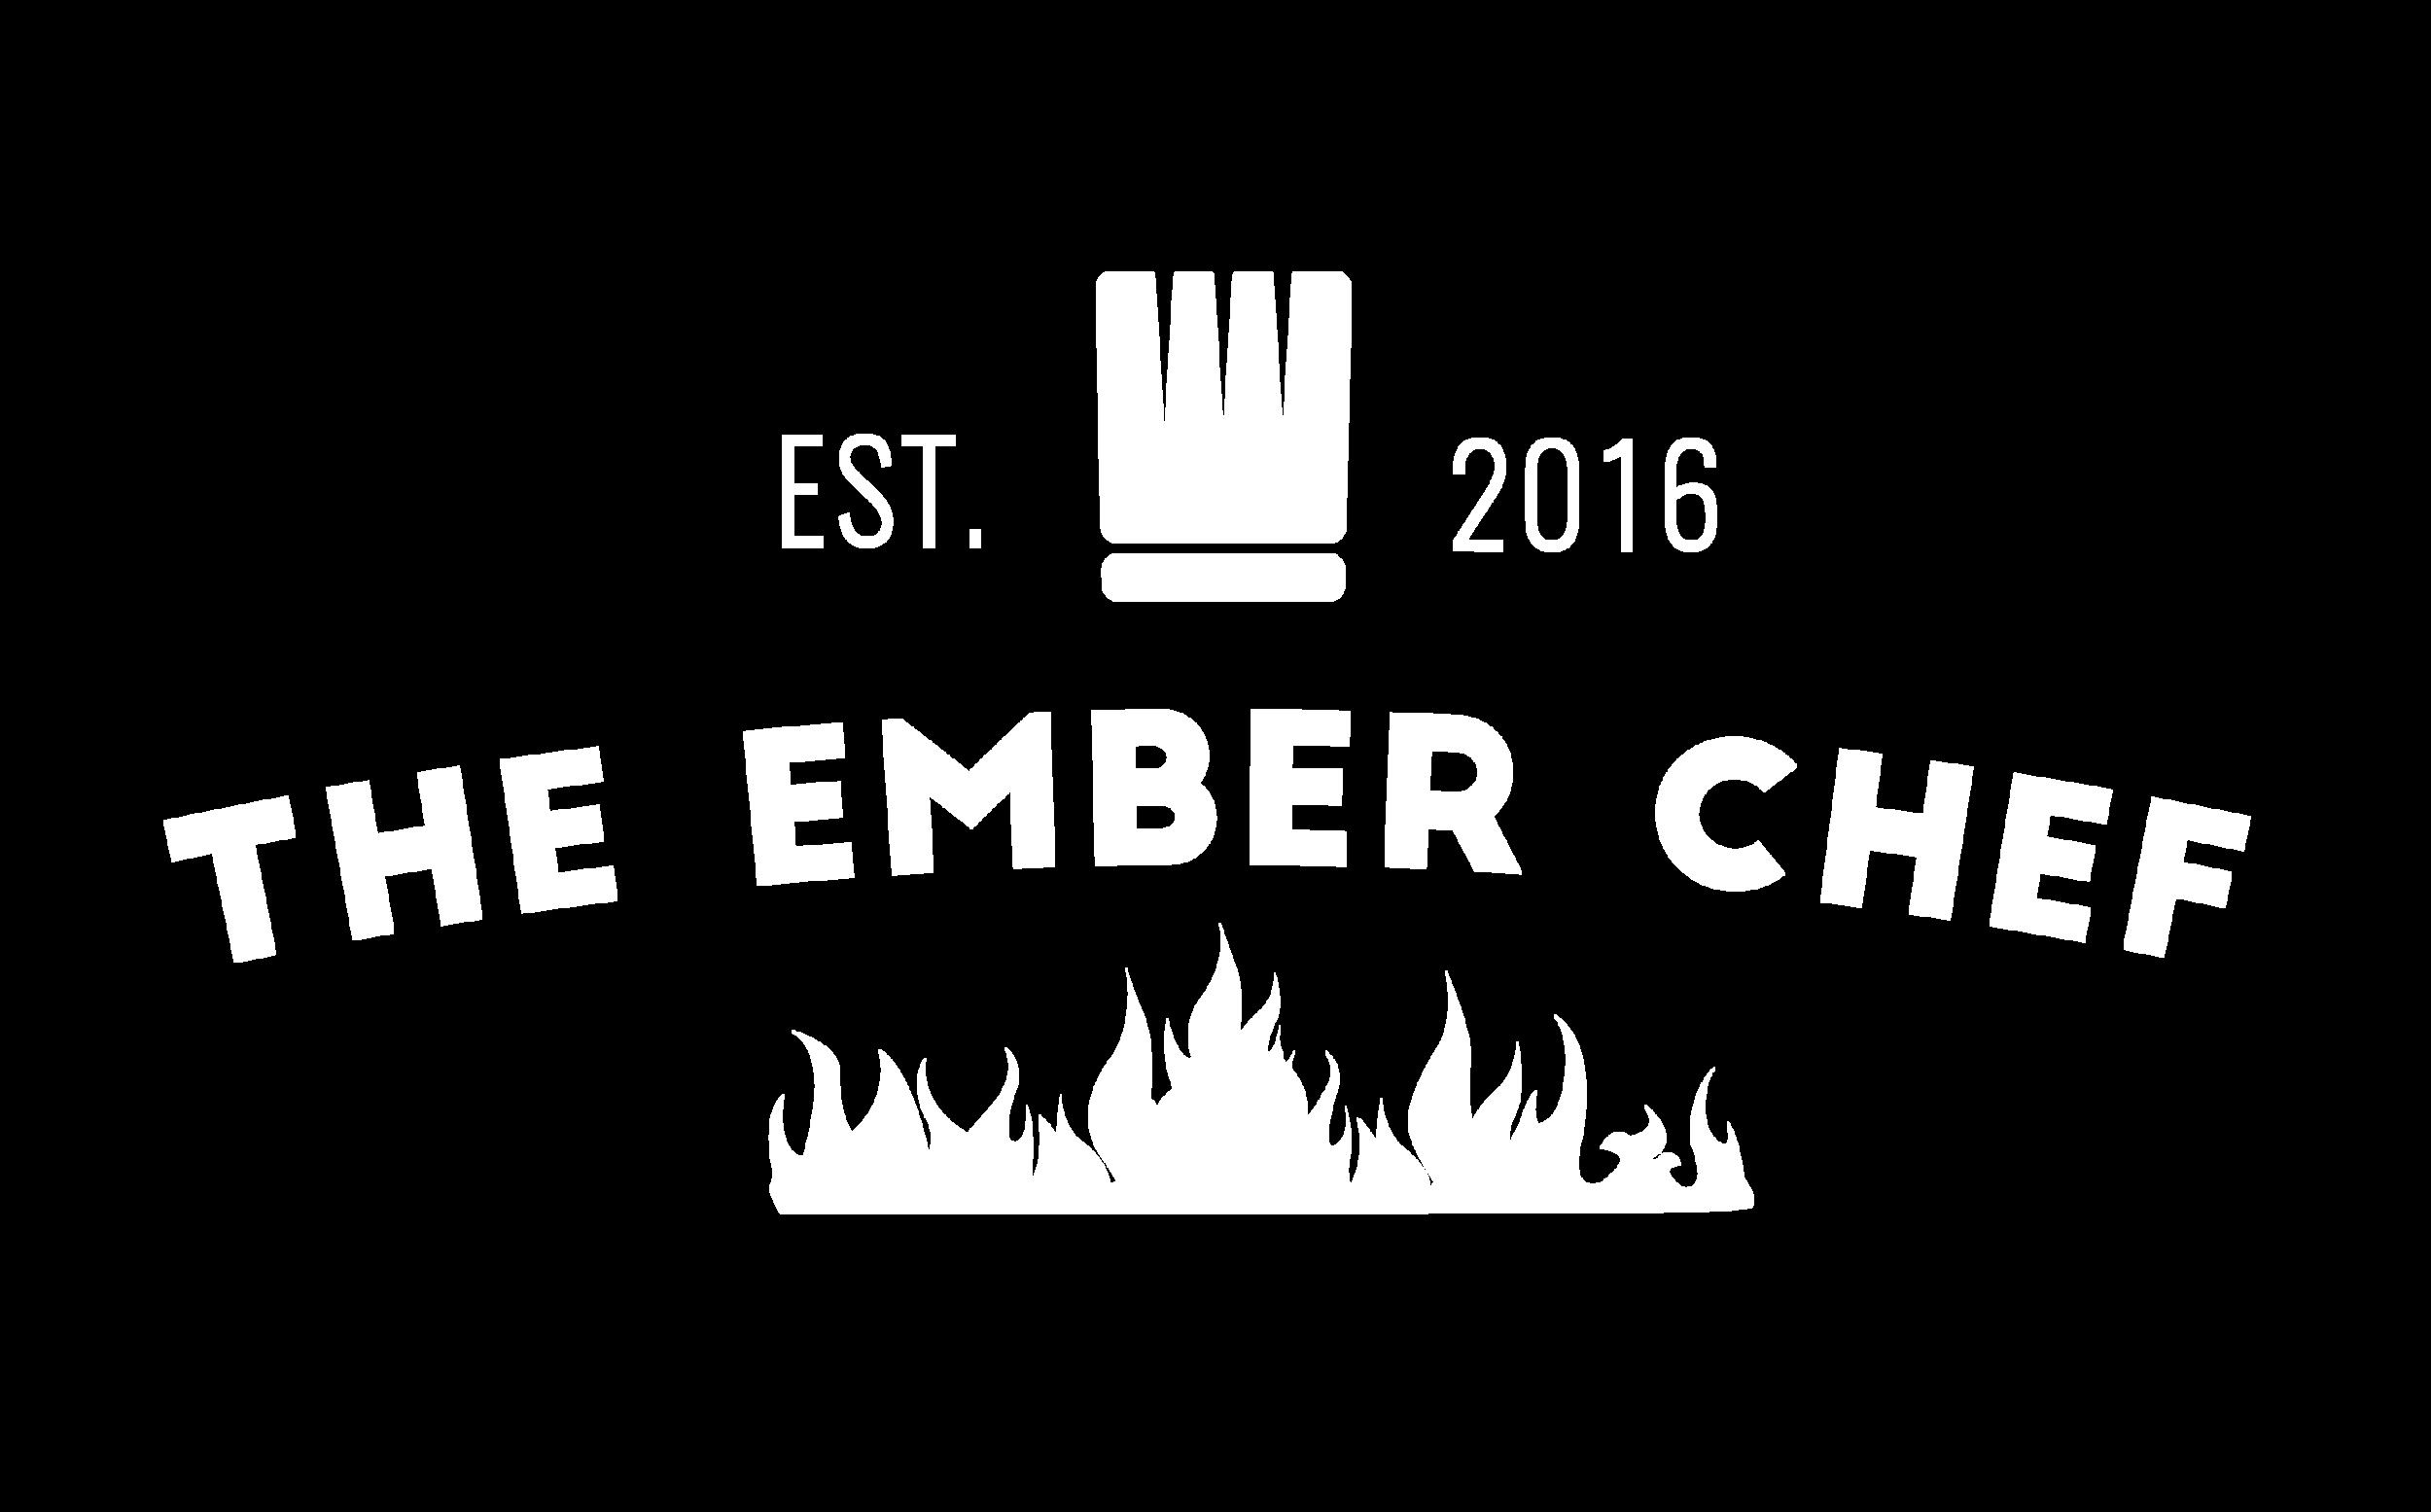 EmberChefProLogo.png